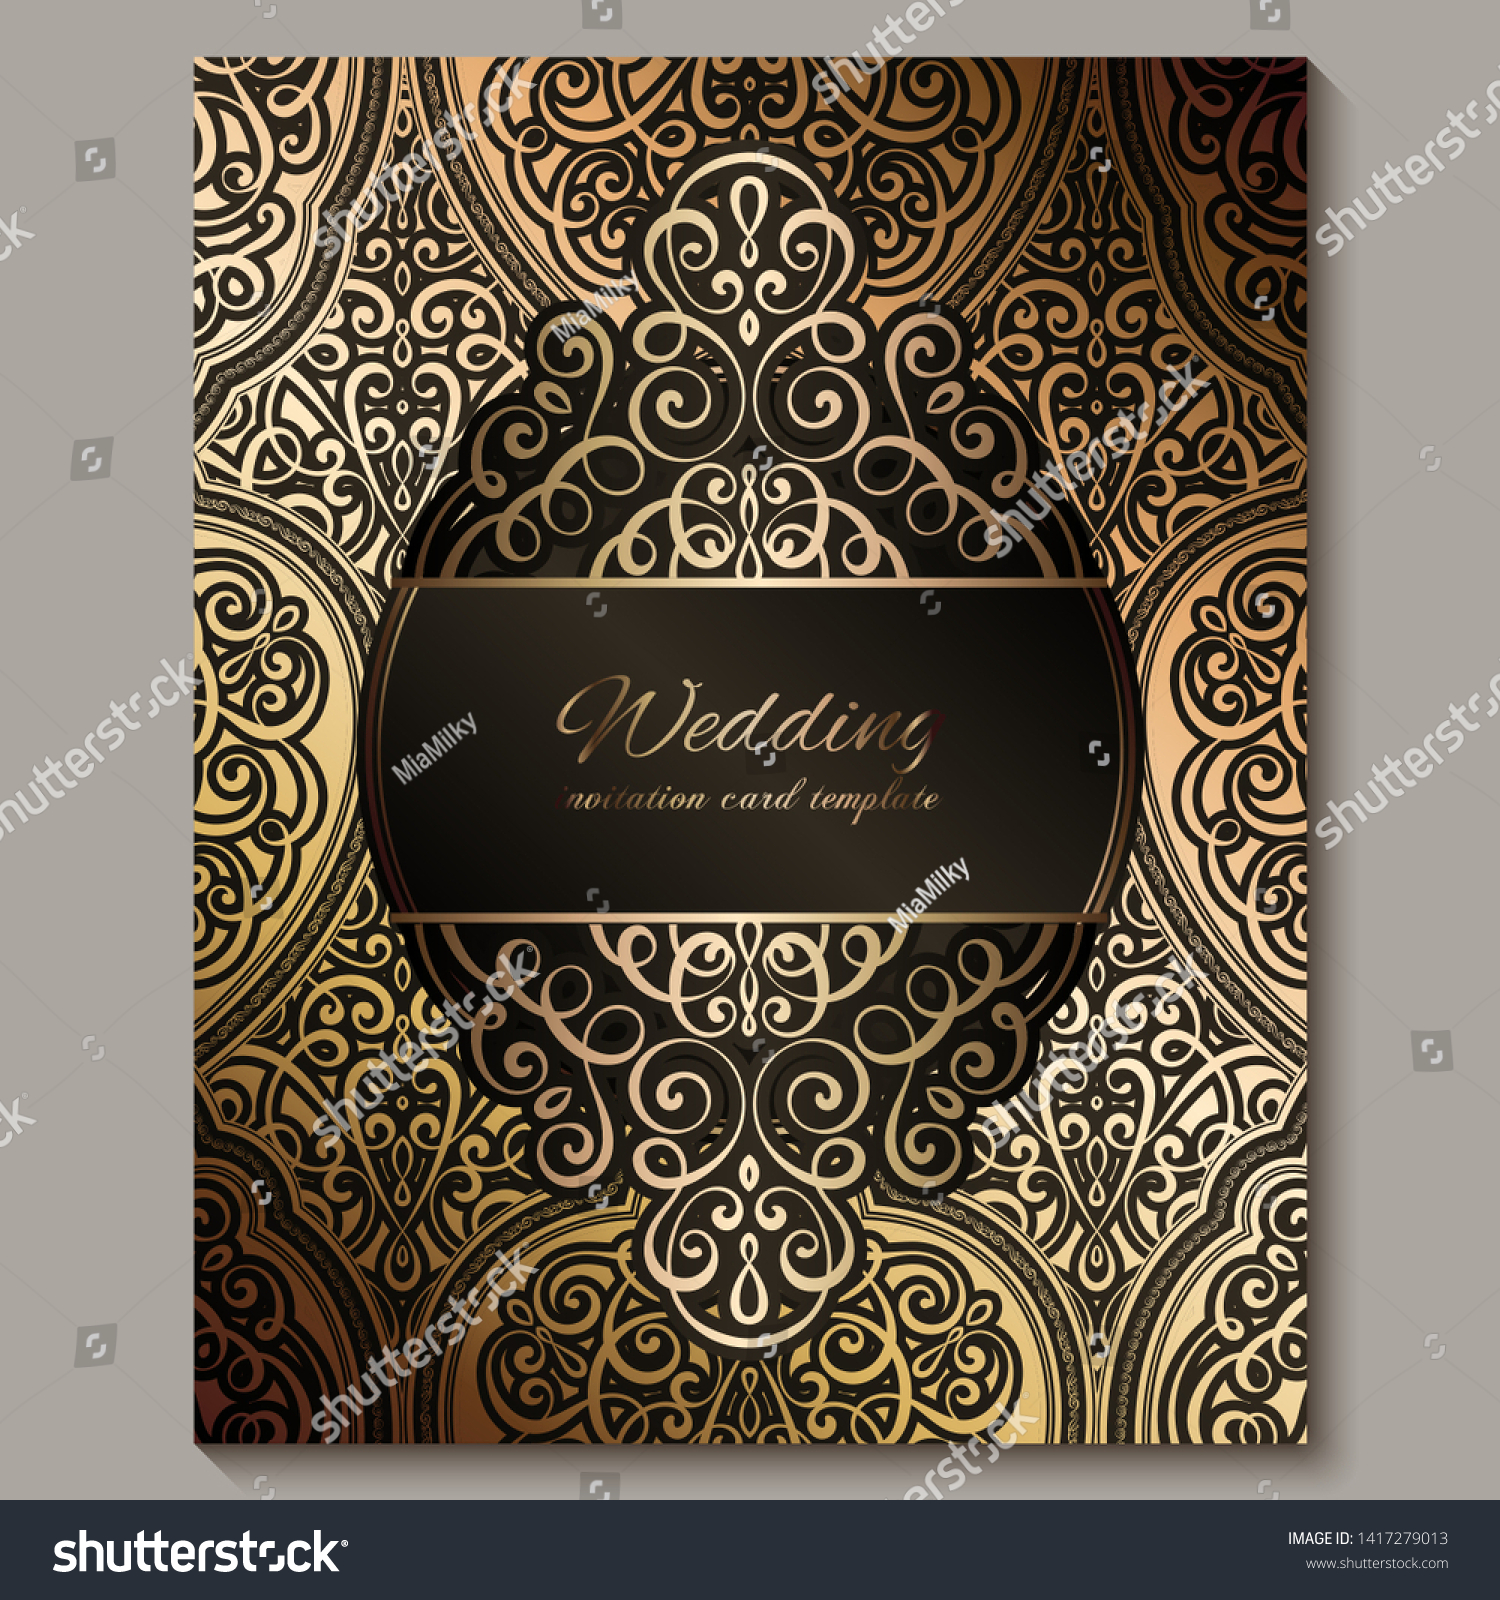 Wedding Invitation Card Black Gold Shiny Stock Vector (Royalty Free)  1417279013